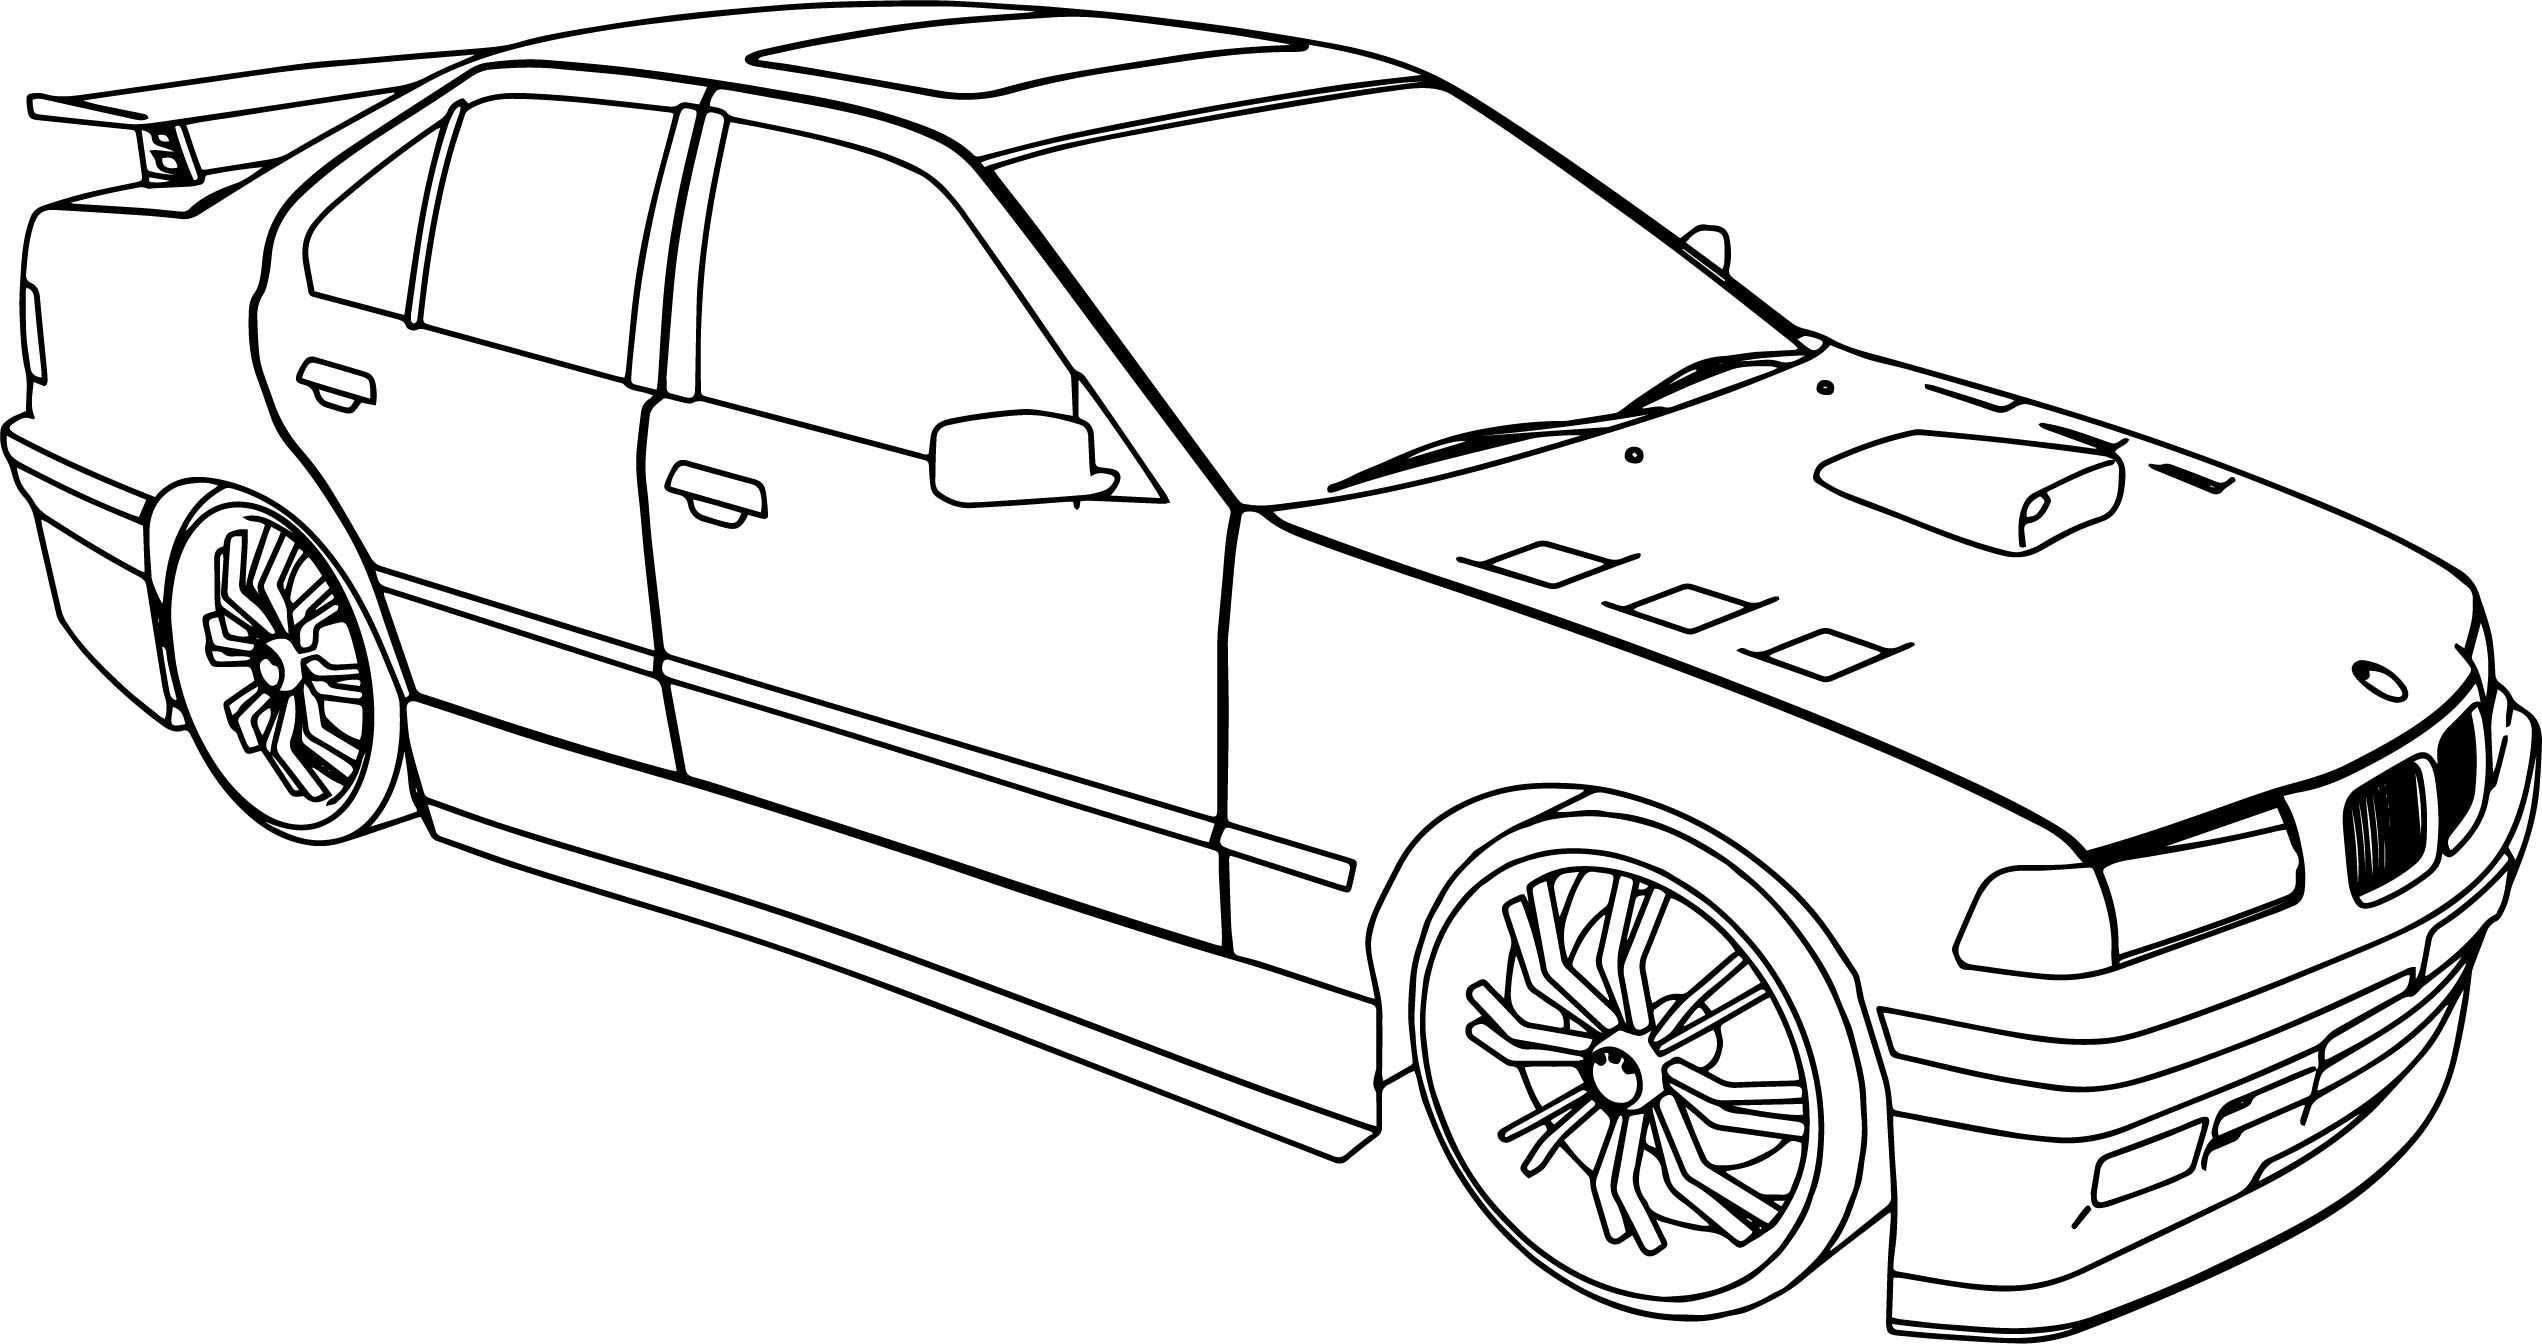 kleurplaat auto bmw